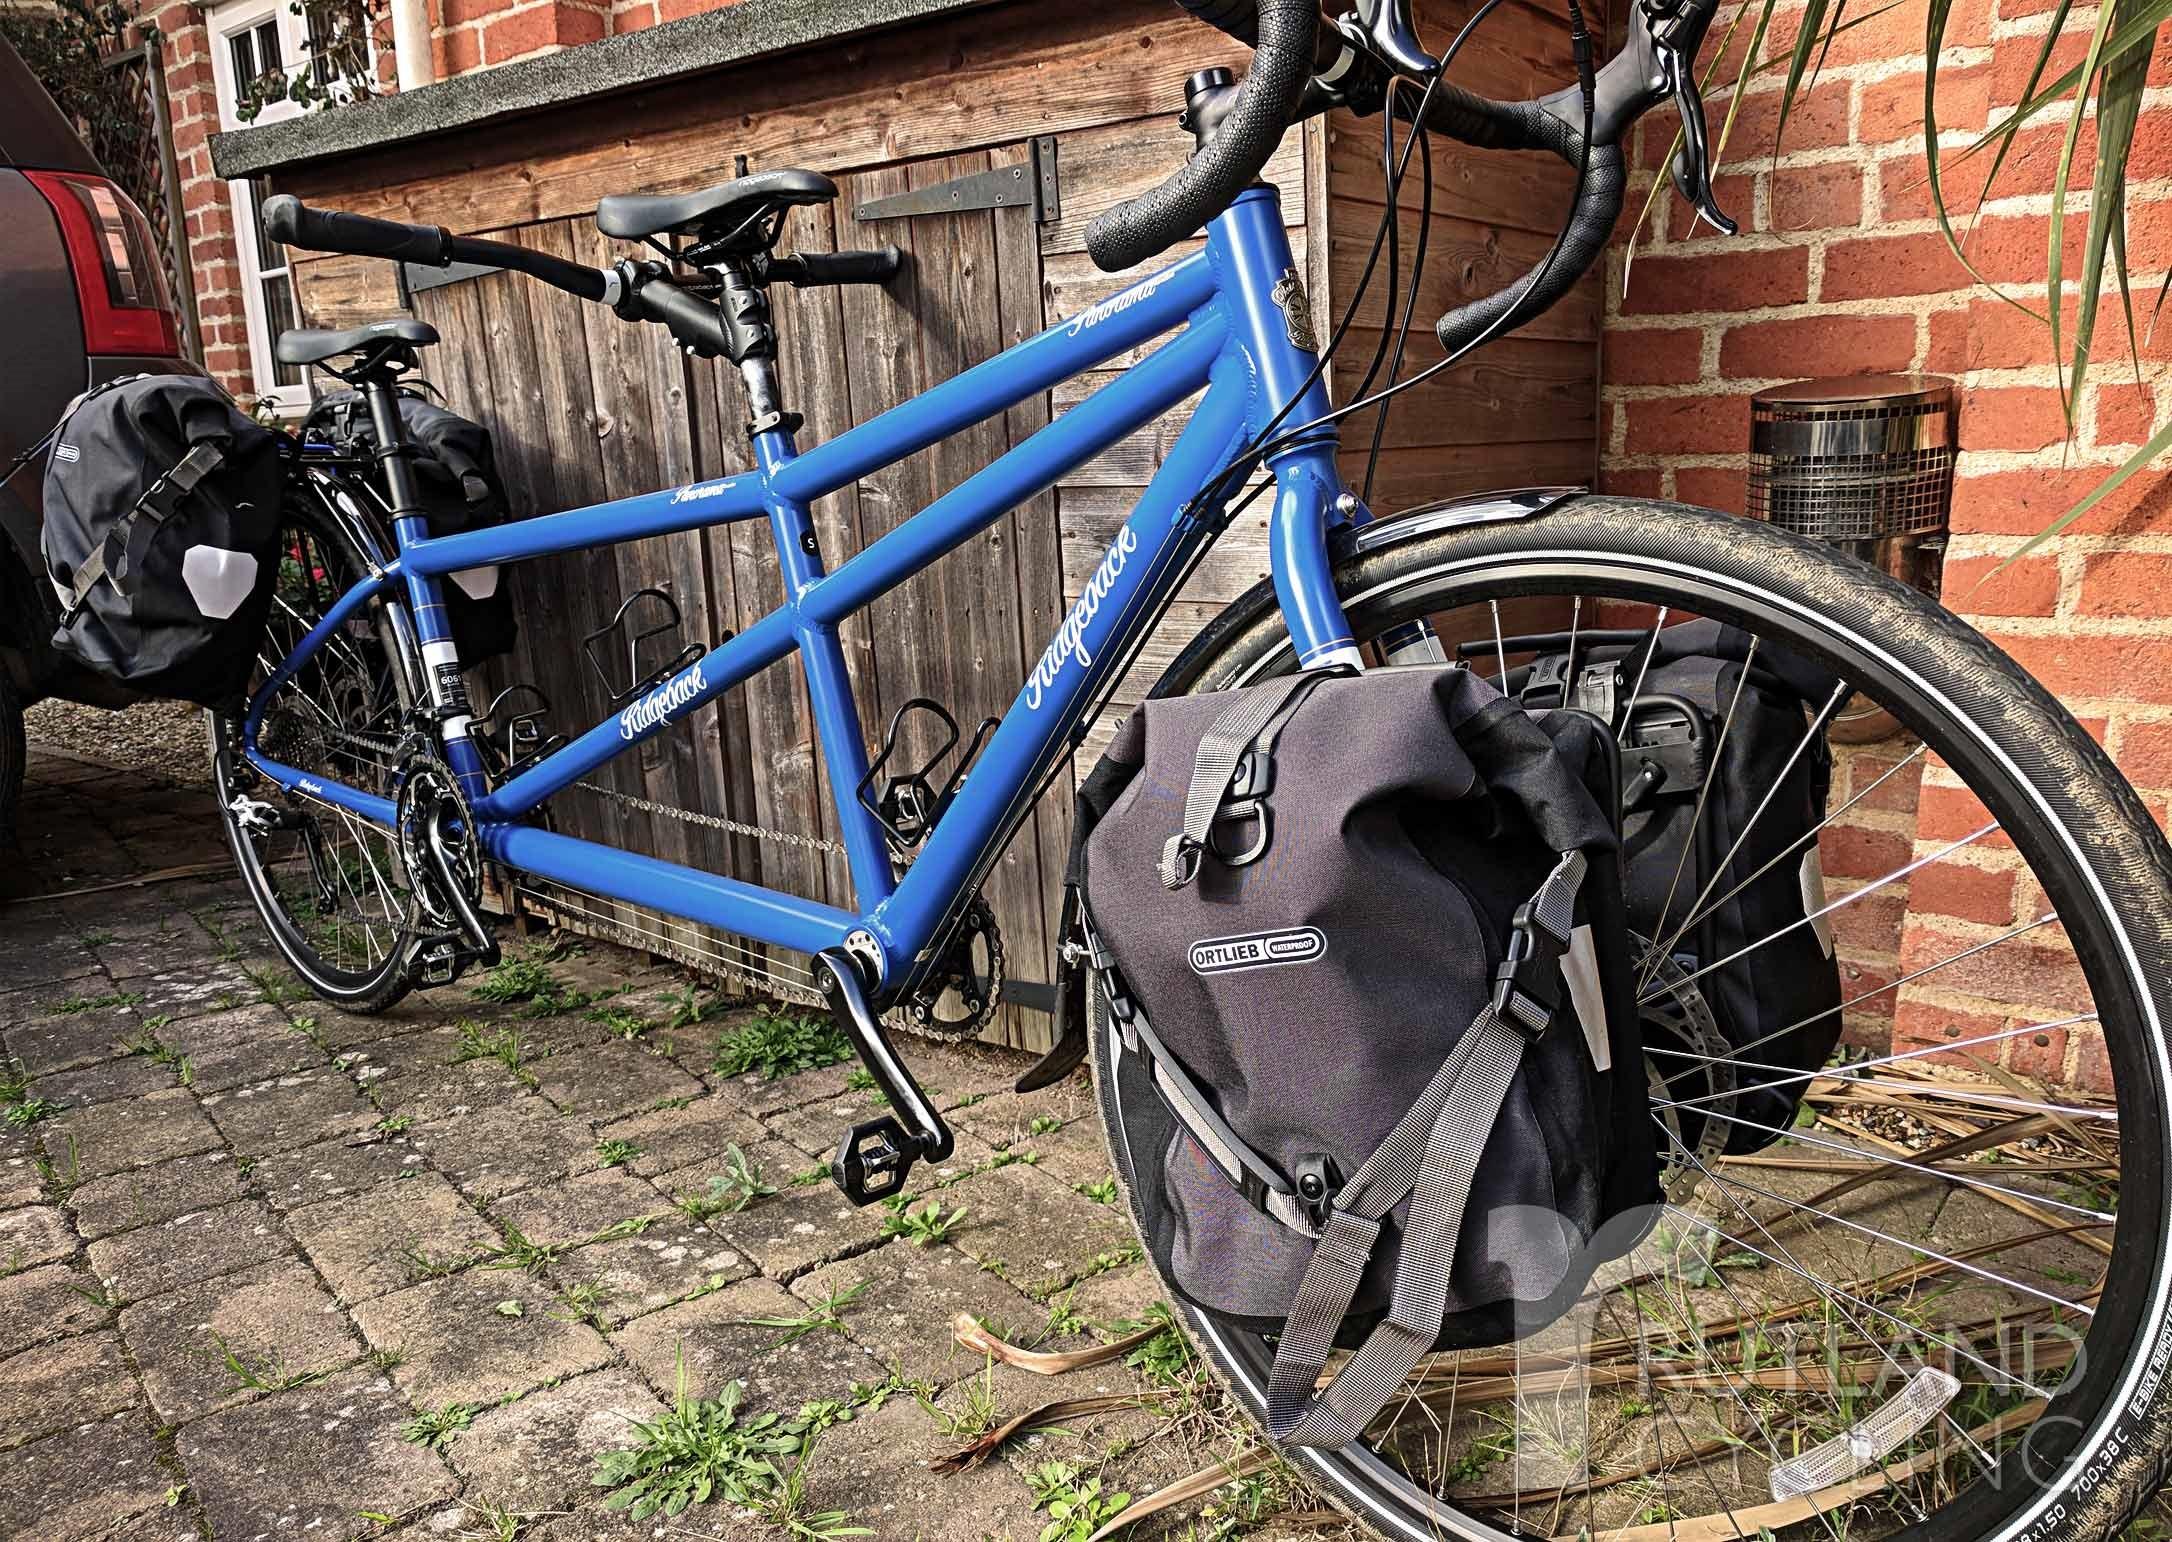 ortlieb-pannier-bike-luggage-back-roller-sport-roller-1